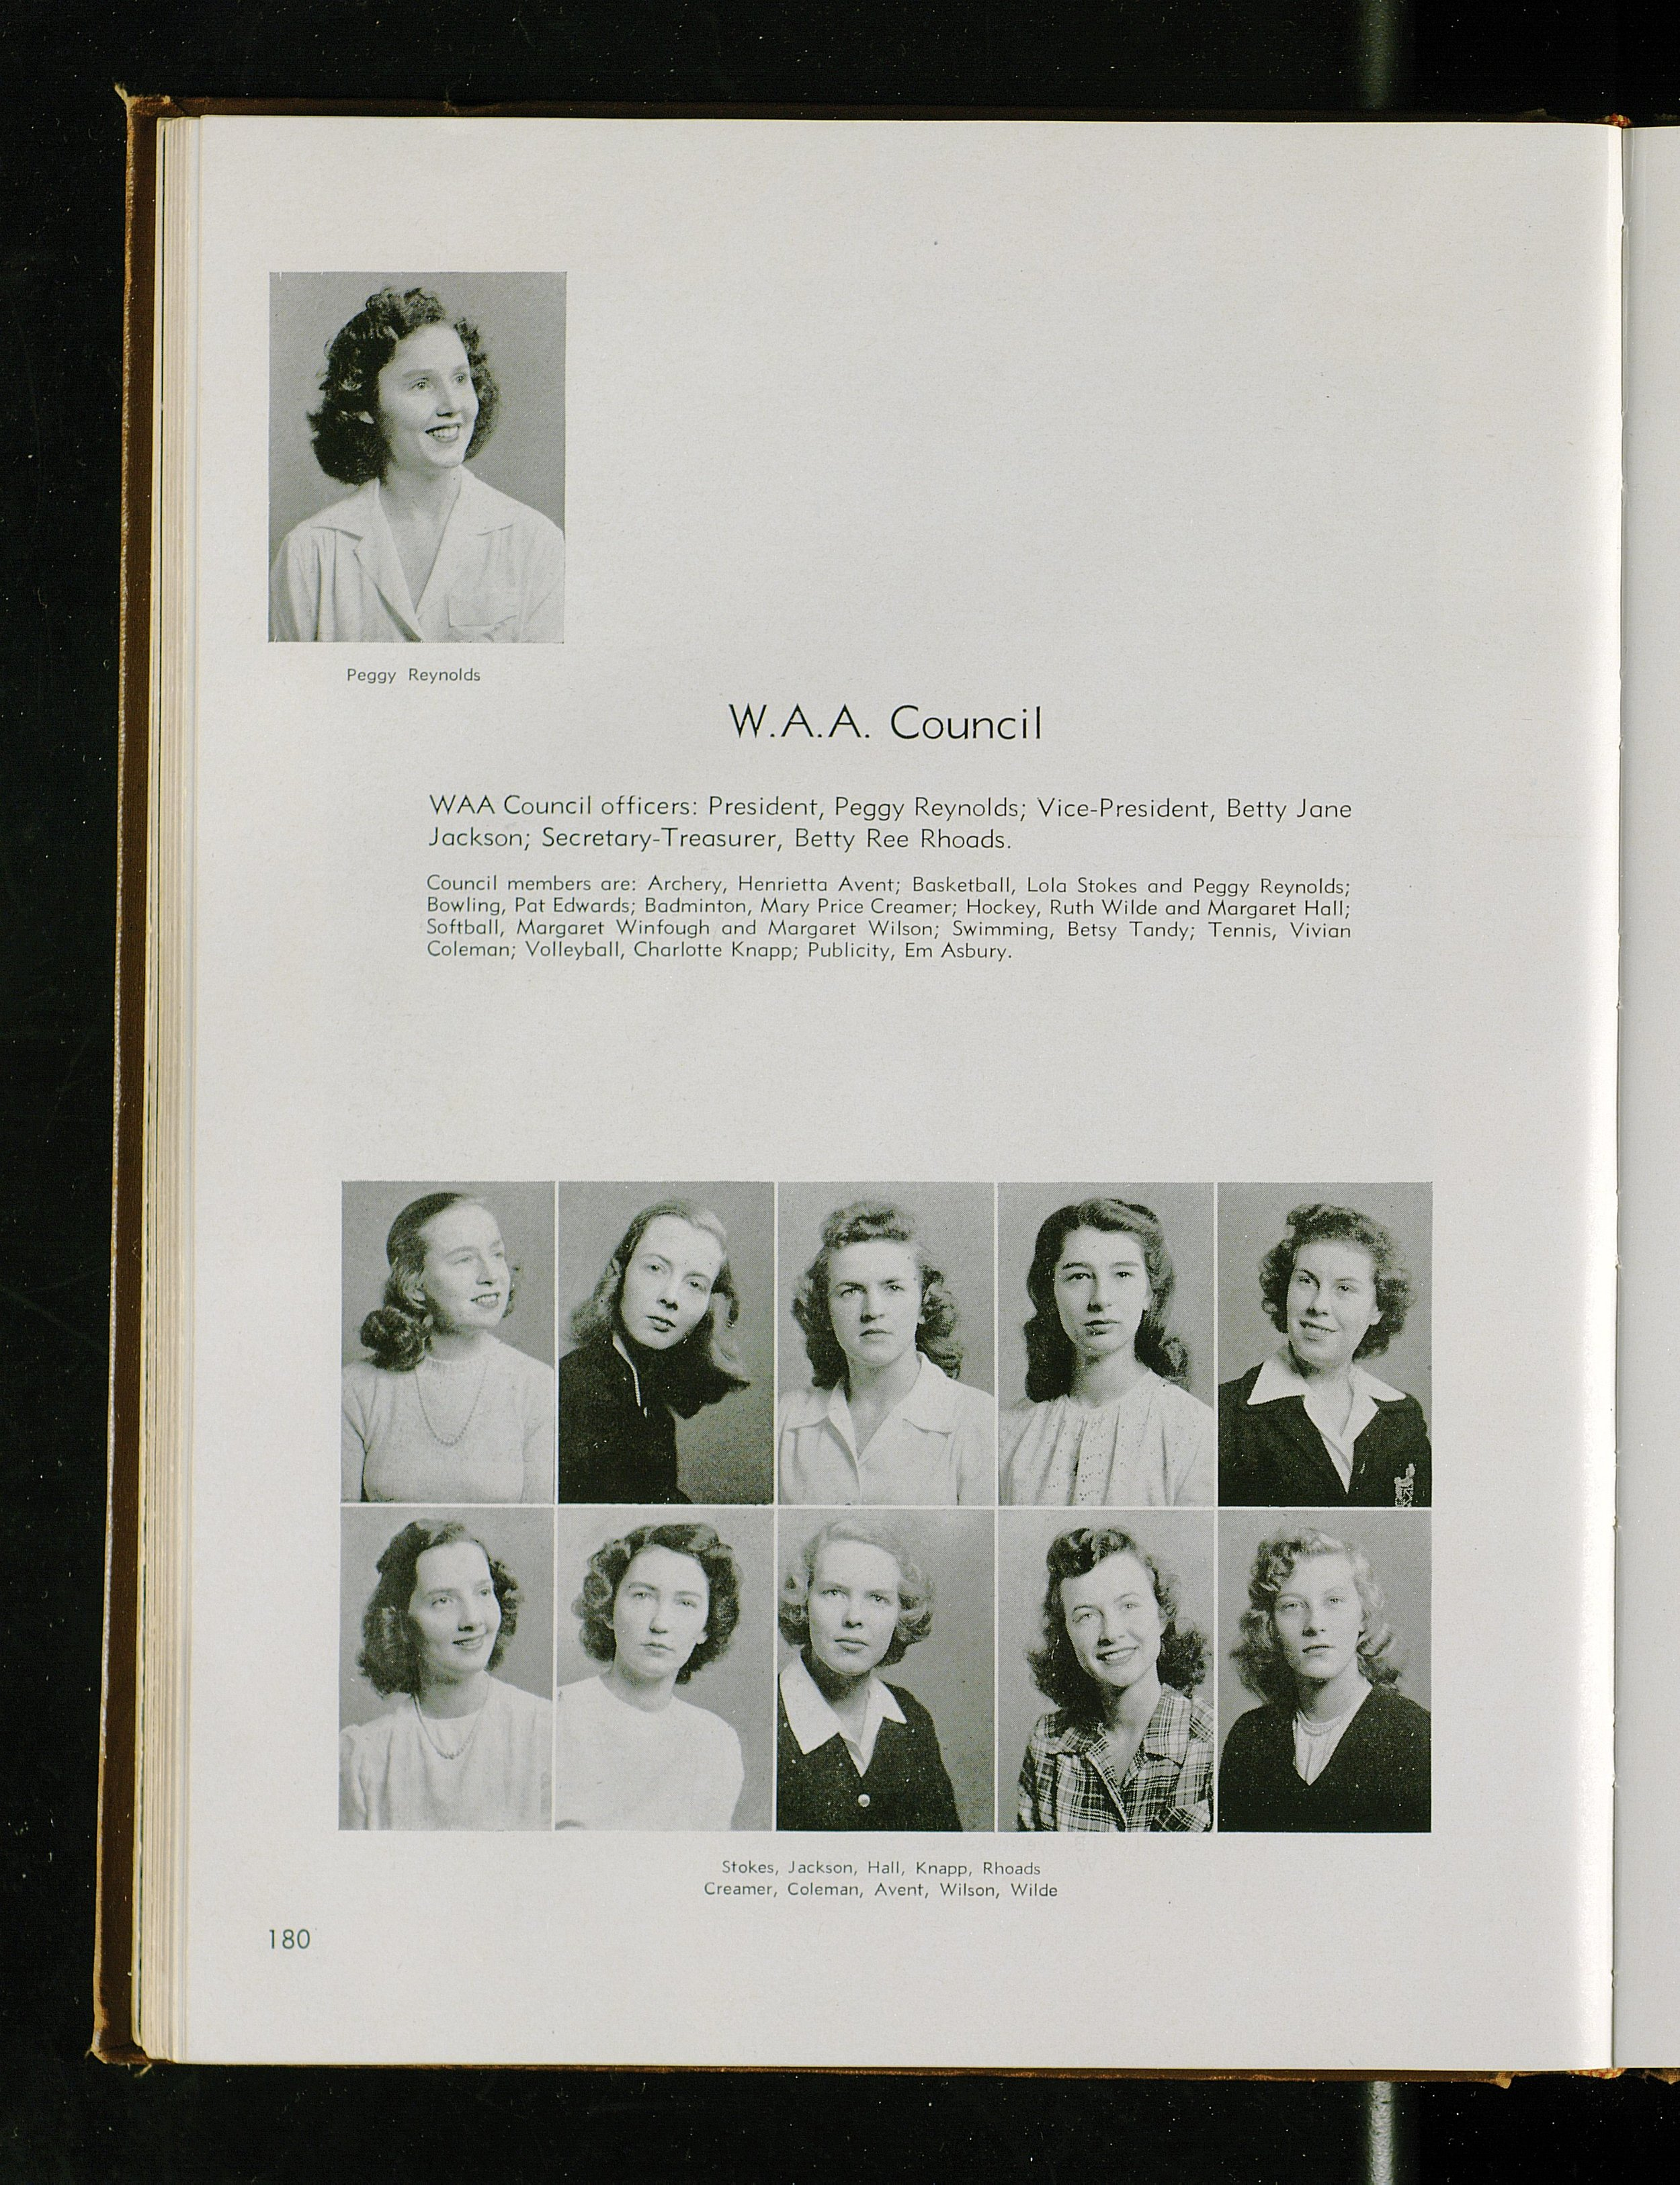 UK WAA Council 1948